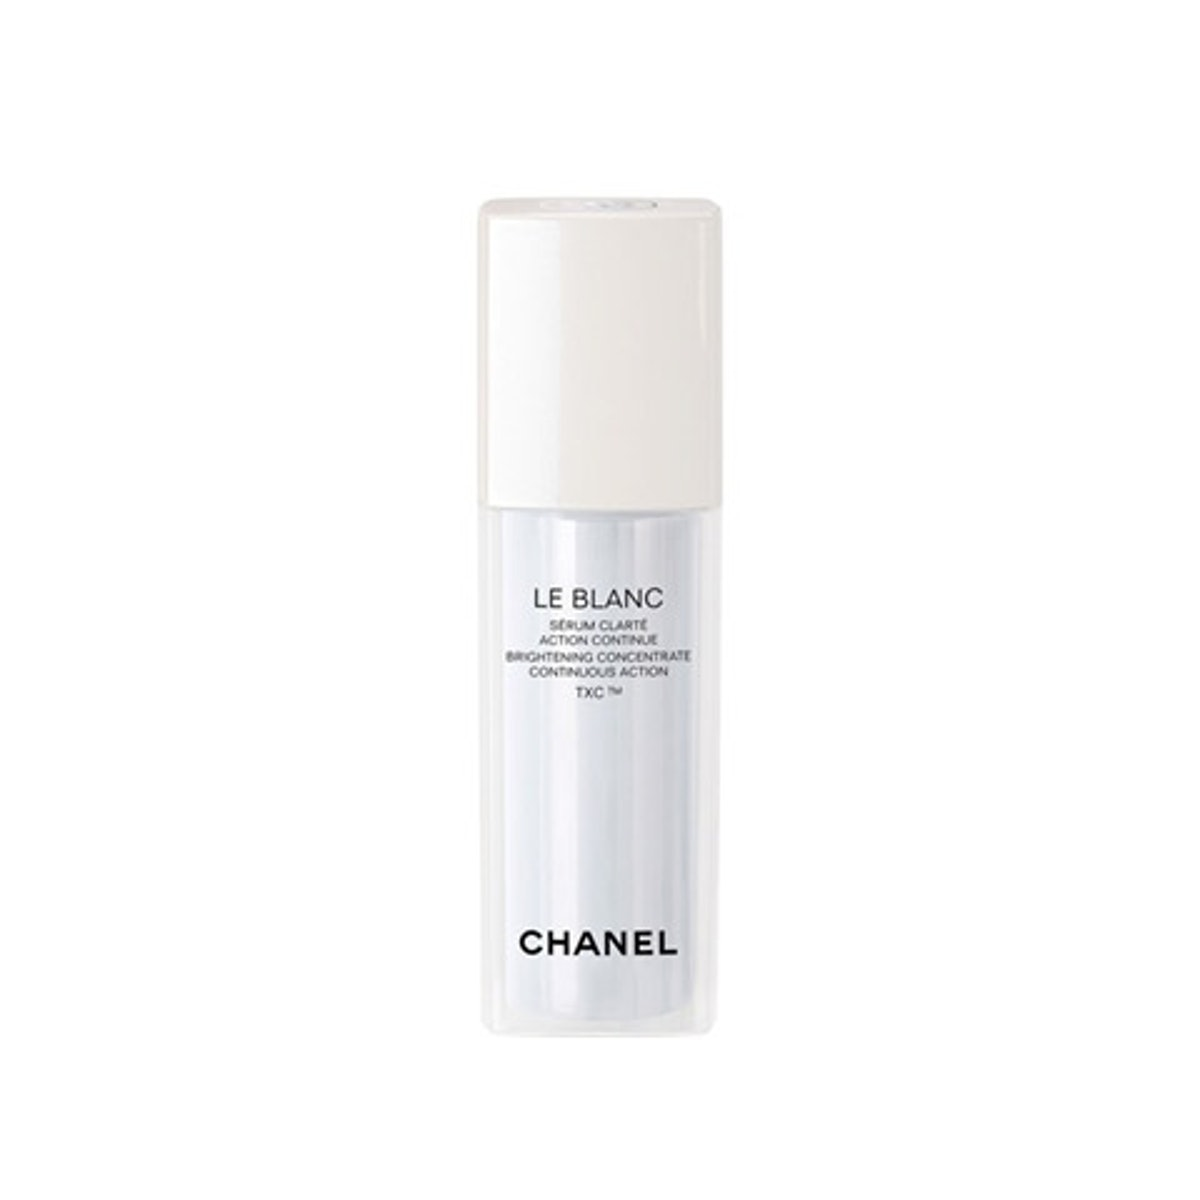 Chanel Le Blanc Intensive